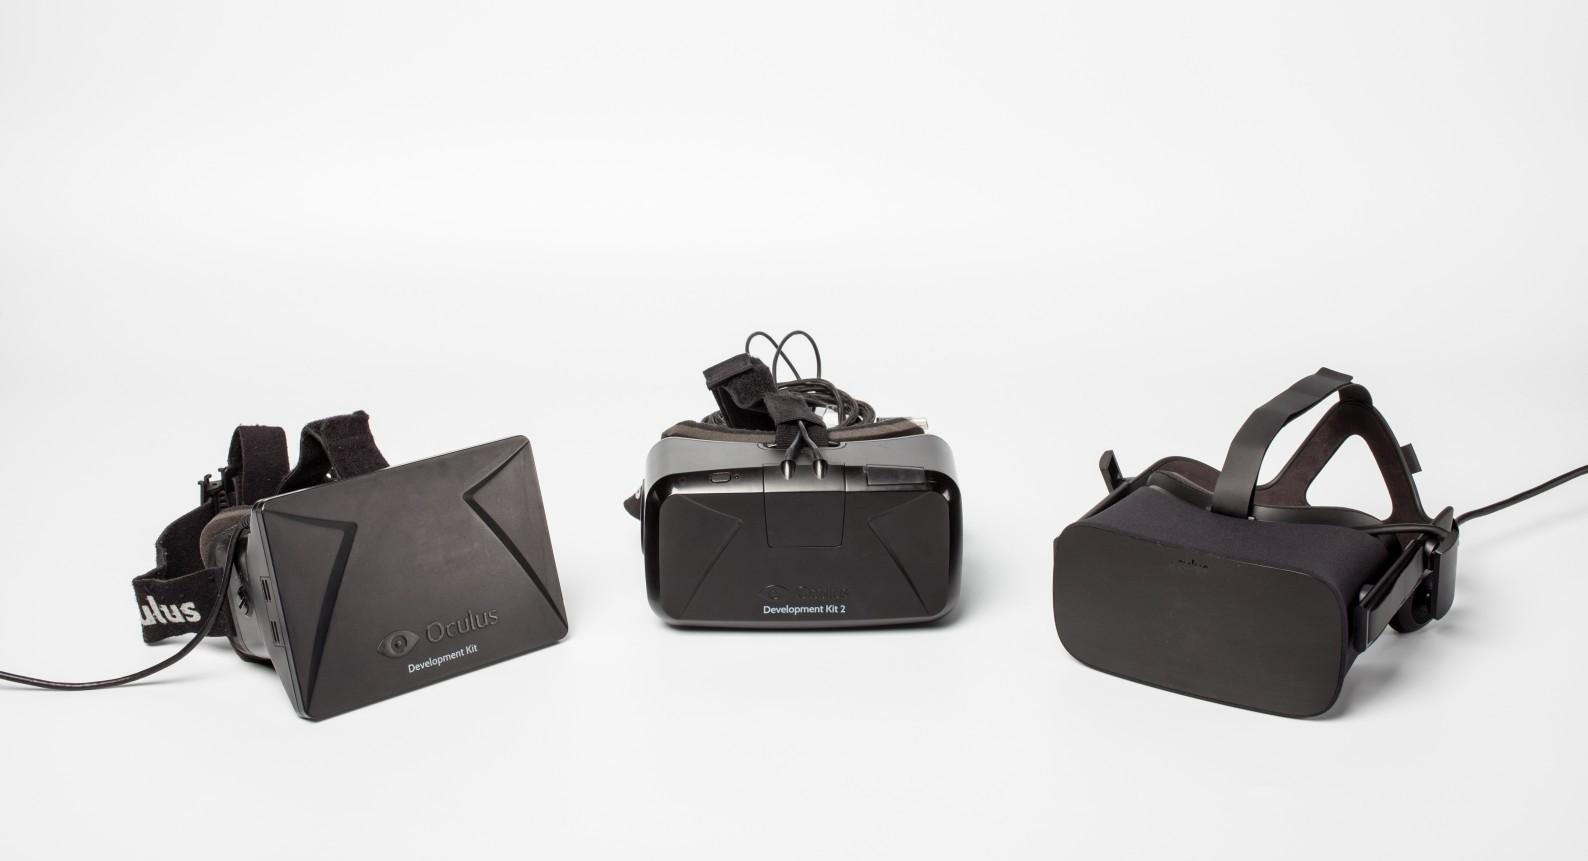 oculus rift im test virtual reality f r die massen c 39 t. Black Bedroom Furniture Sets. Home Design Ideas